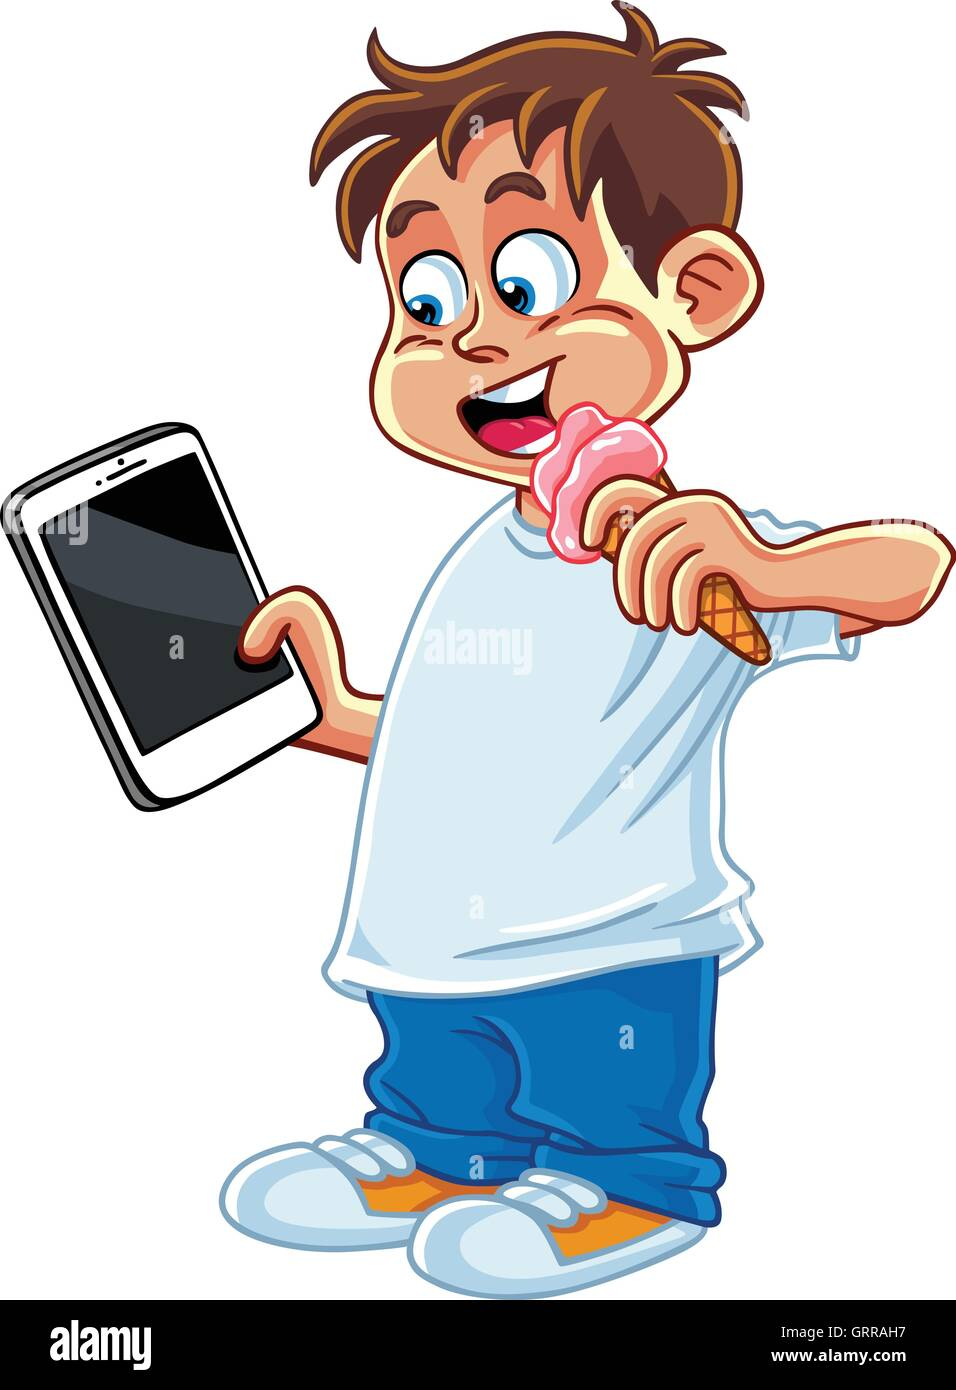 Kid Playing Tablet Phone Gadget Cartoon Vector - Stock Image